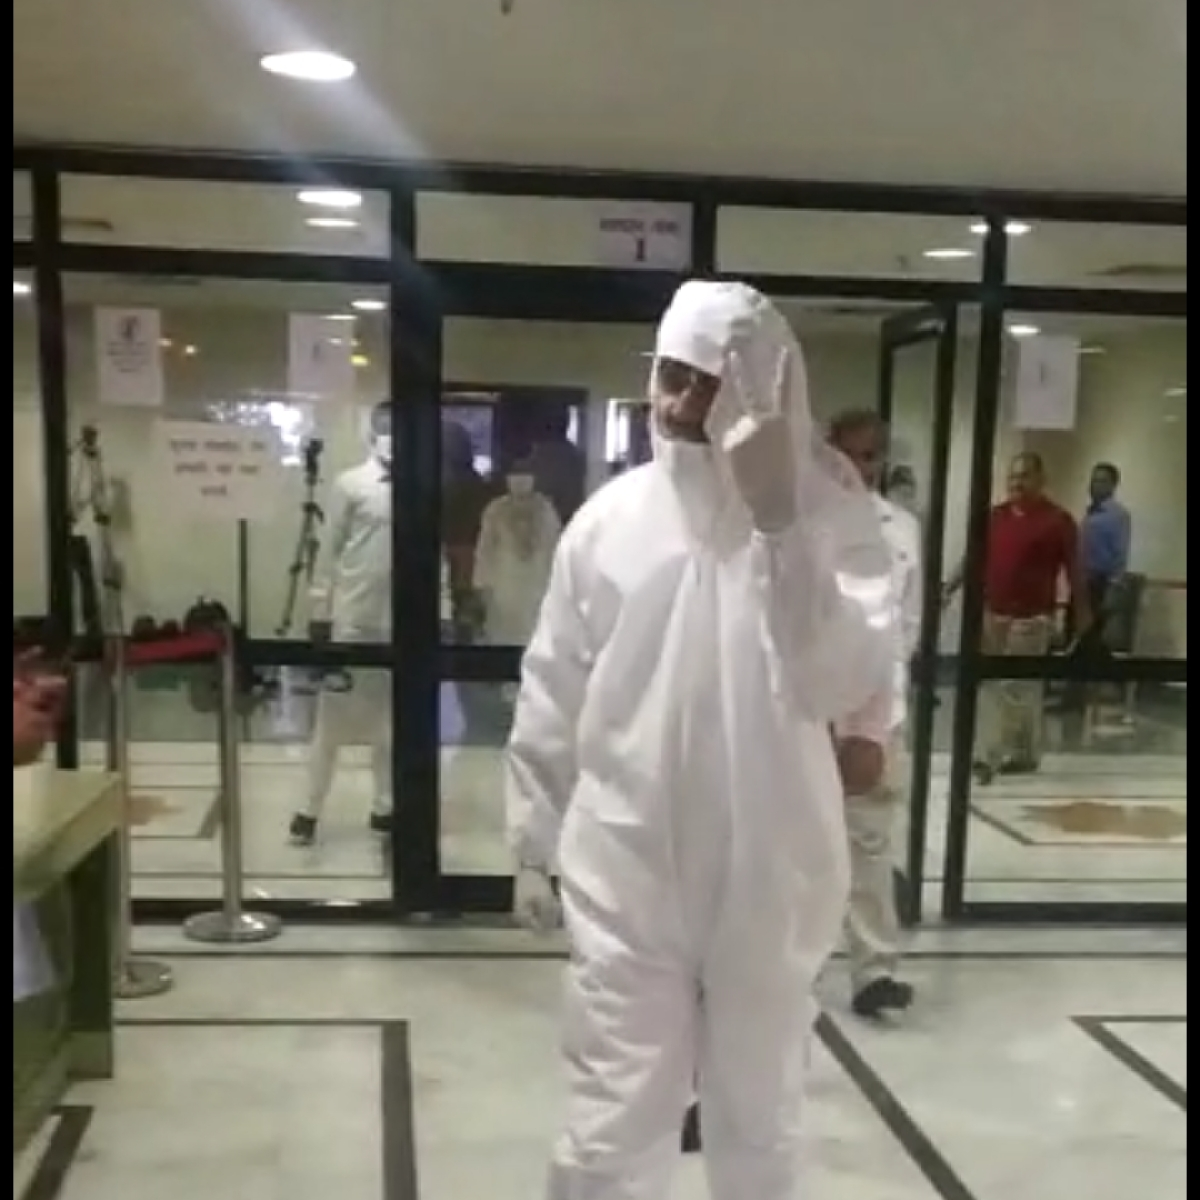 BJP files police complaint against Congress MLA Wajib Ali for violating quarantine rules